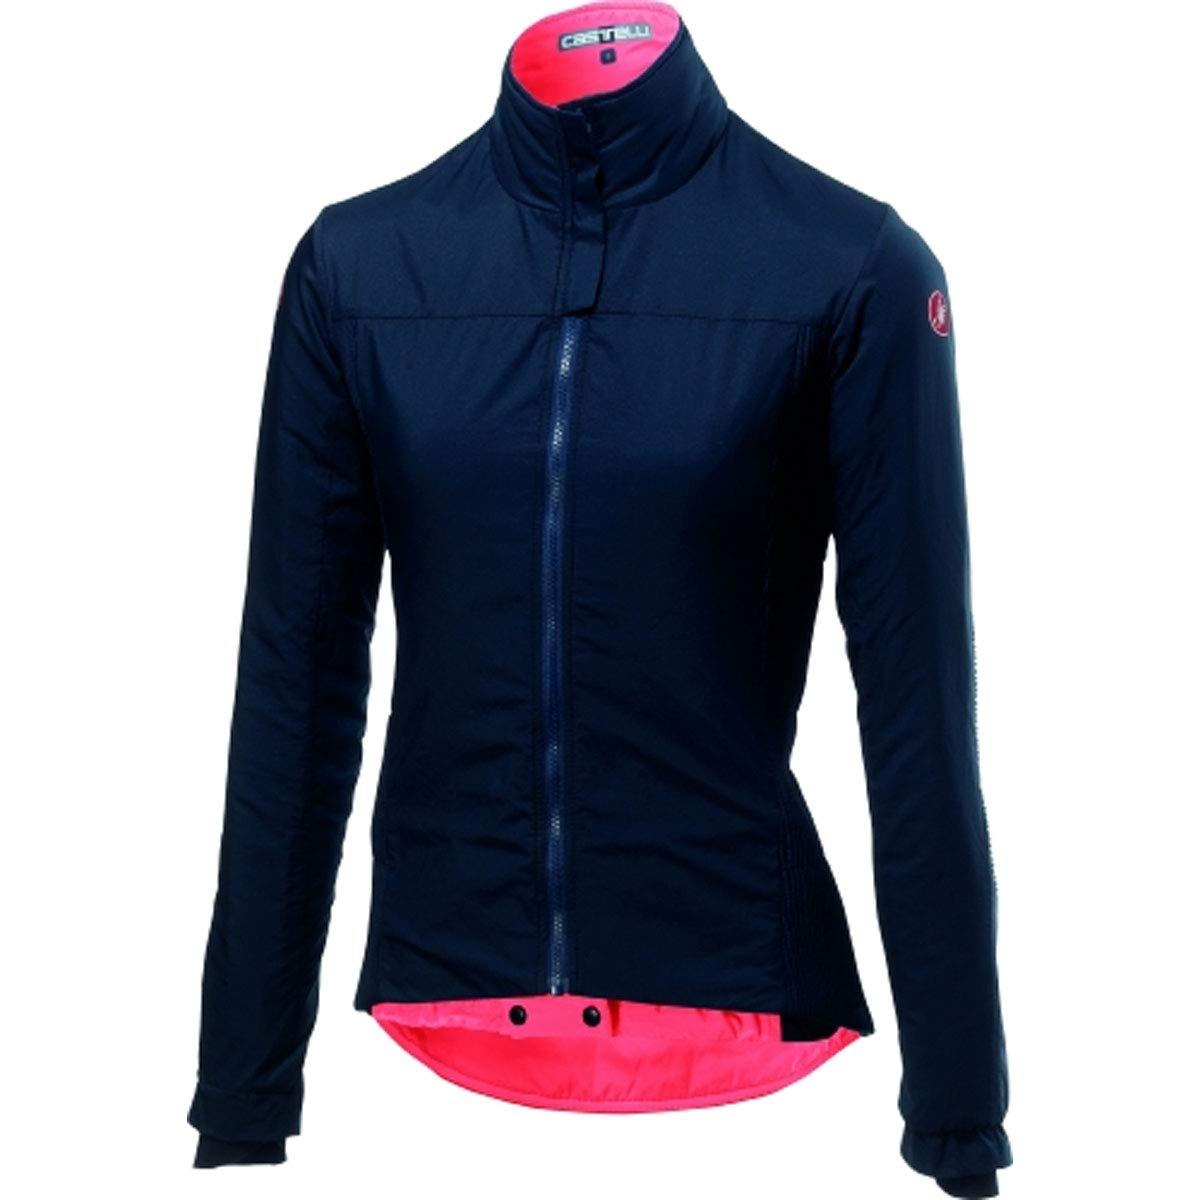 Amazon.com: Castelli Elemento Lite W Jacket: Sports & Outdoors